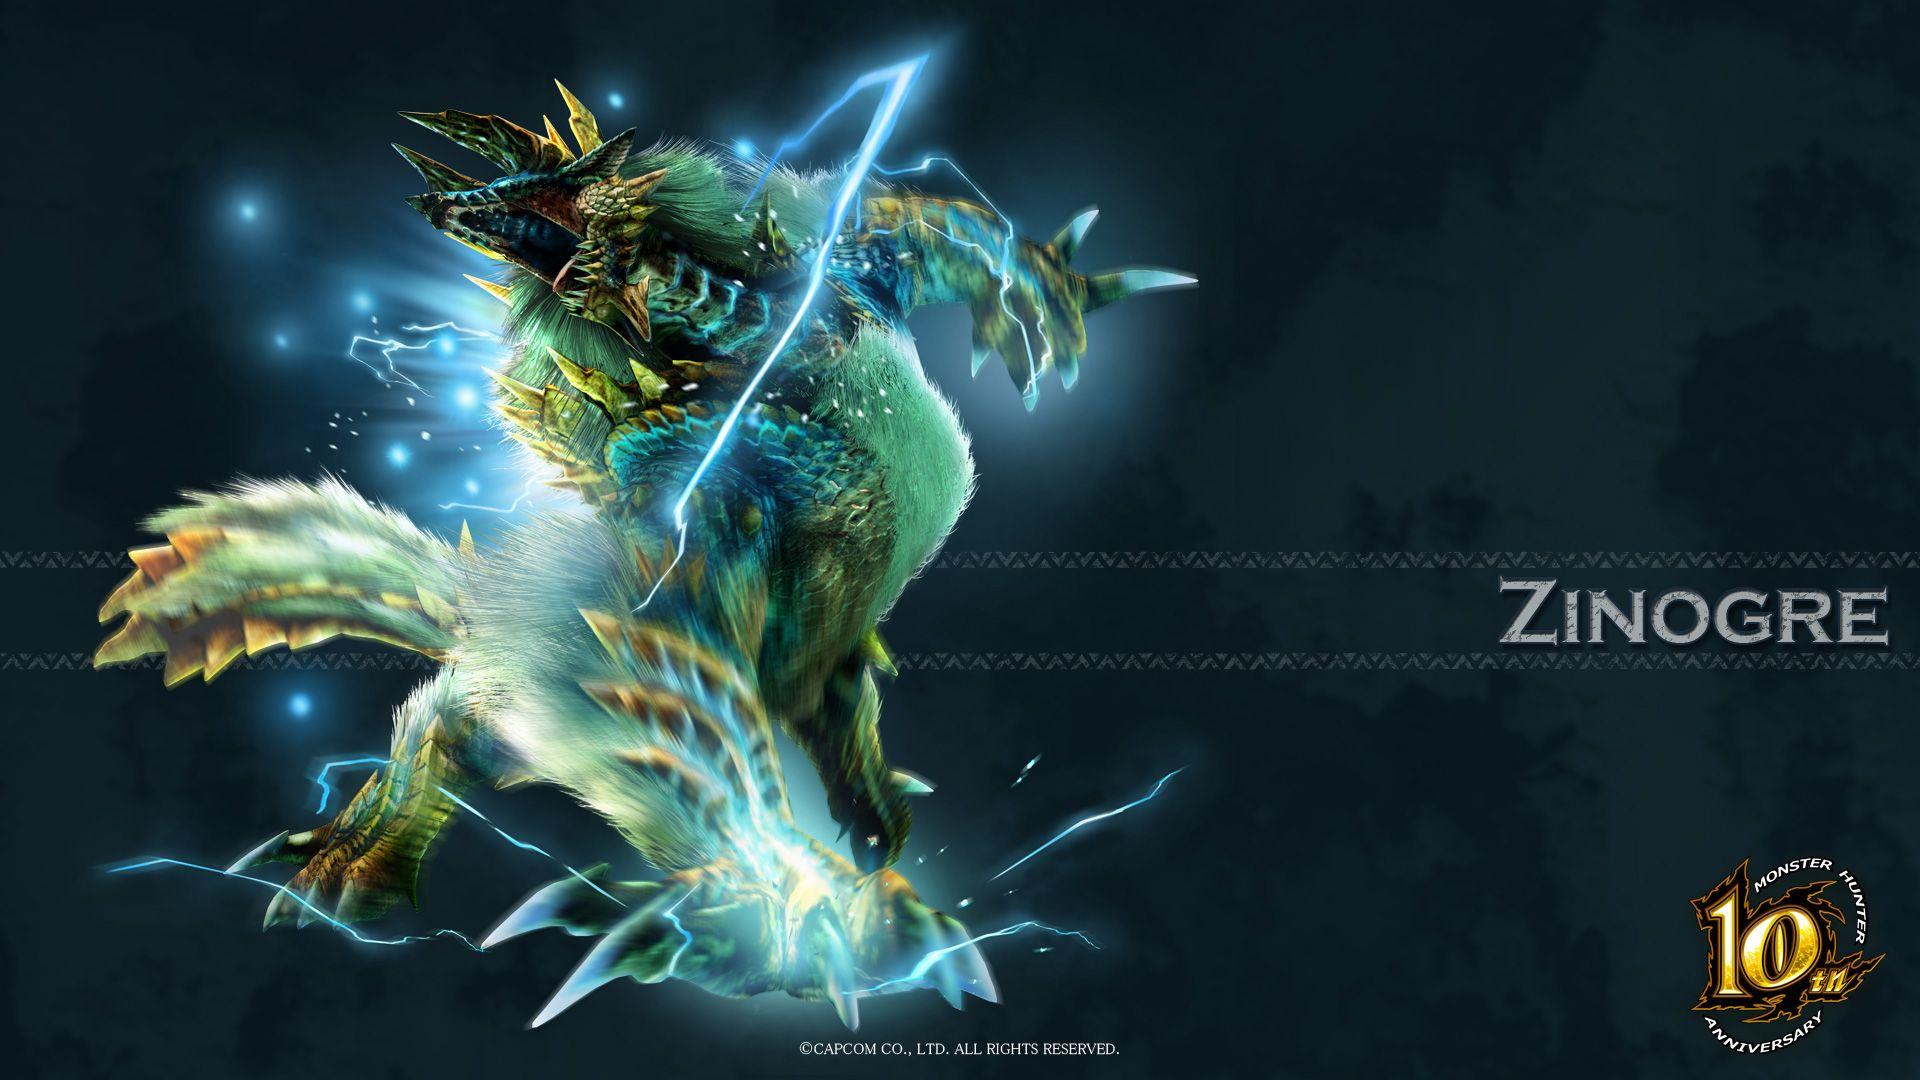 Image For Free Zinogre Monster Hunter Video Game Hd Wallpaper